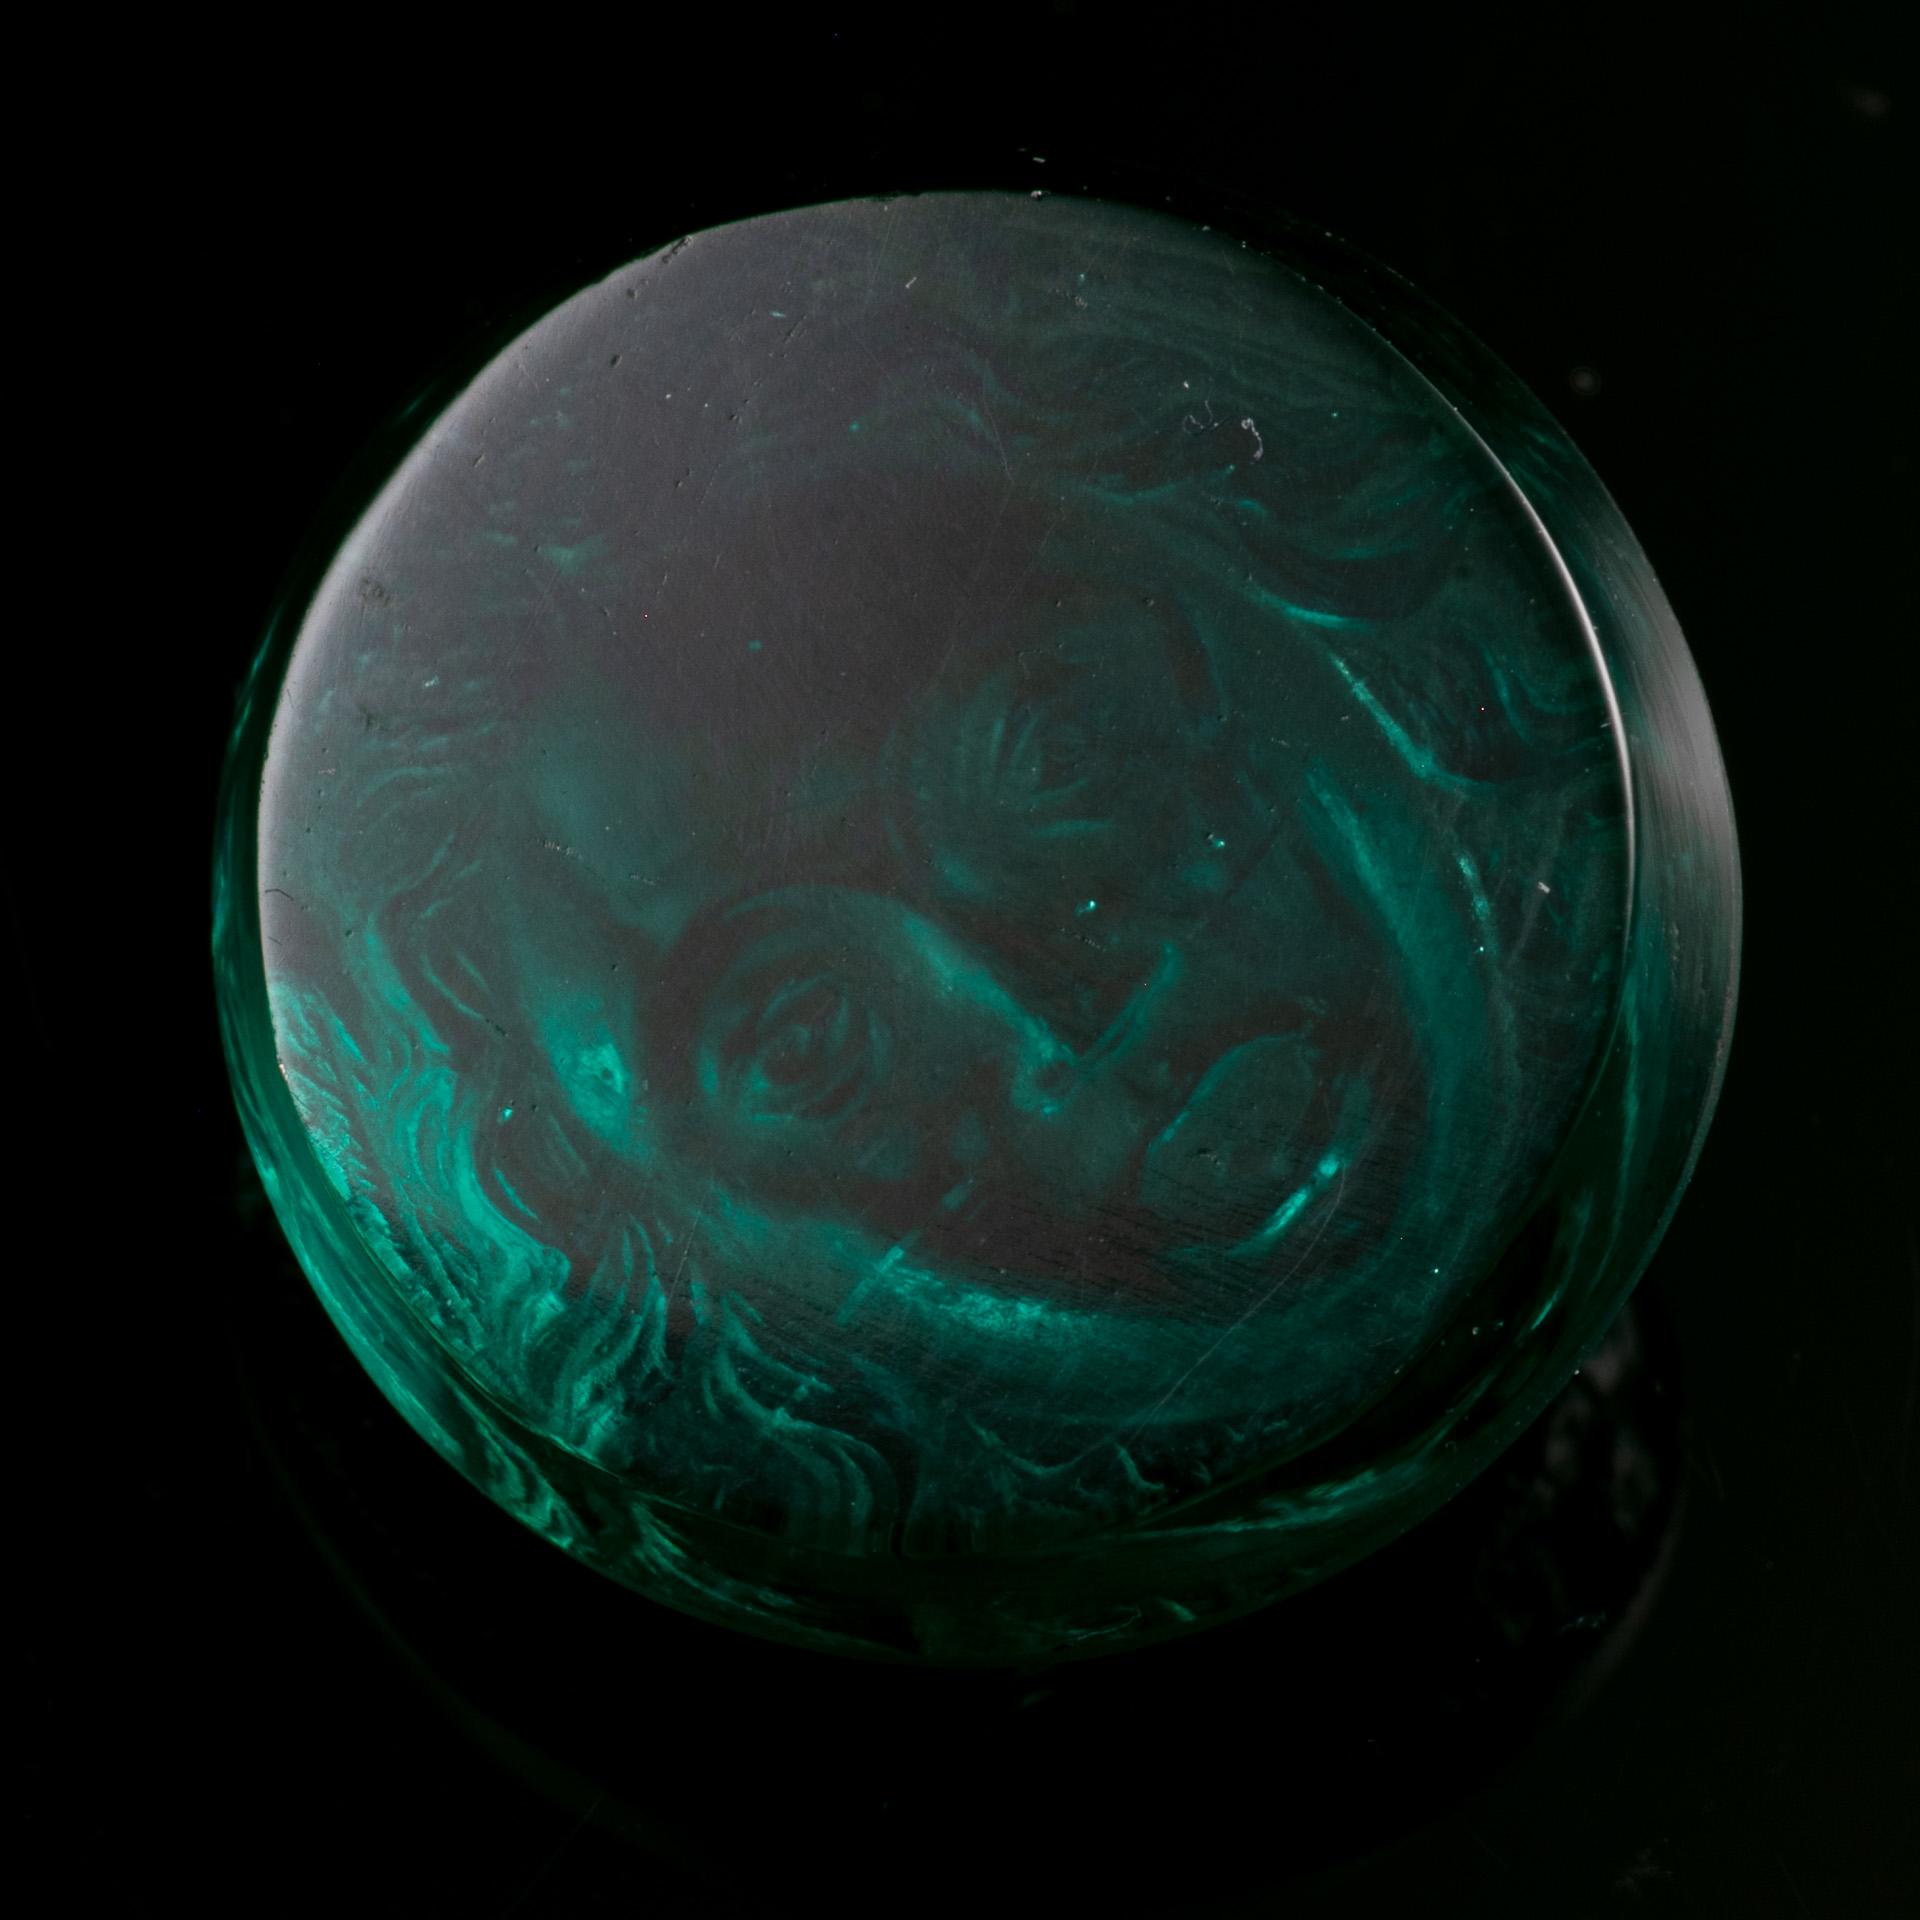 Roman Glass Cameo Depicting Medusa - Image 6 of 6